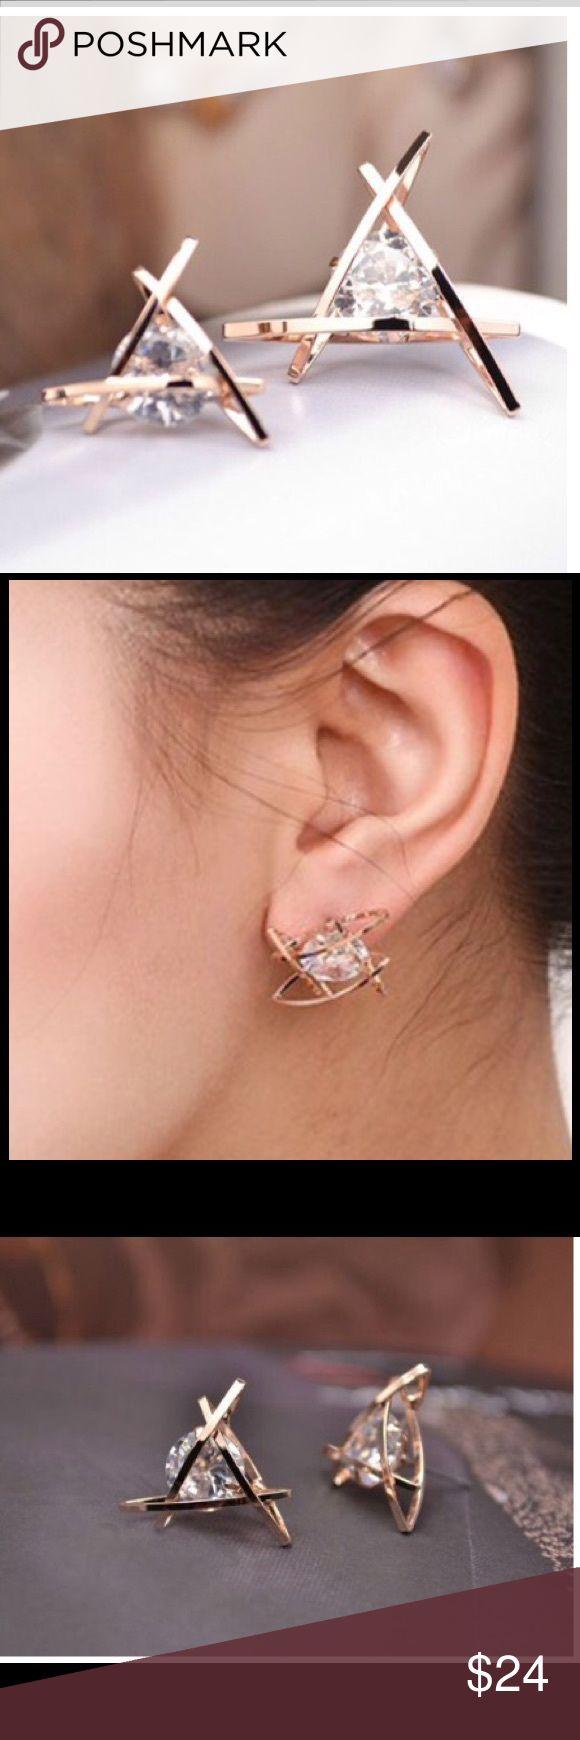 HP best in boutique Swarovski unique earrings rose gold plated swarovsky very uniqueprice is firm ❣unless bundle La belle Jewelry Earrings